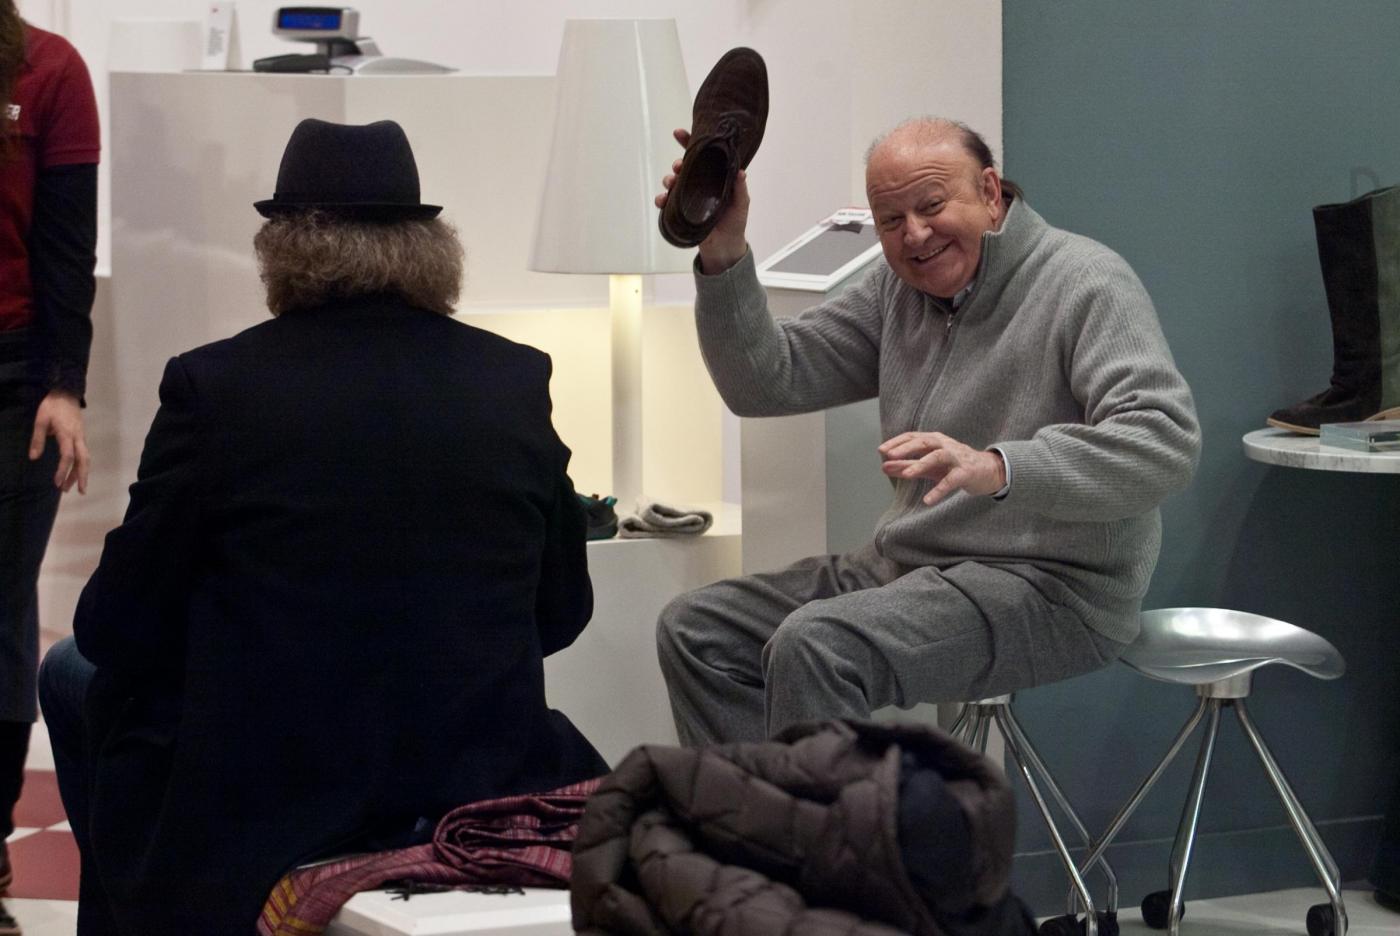 Massimo Boldi compra ciabatte meglio a righe o a tinta unica08